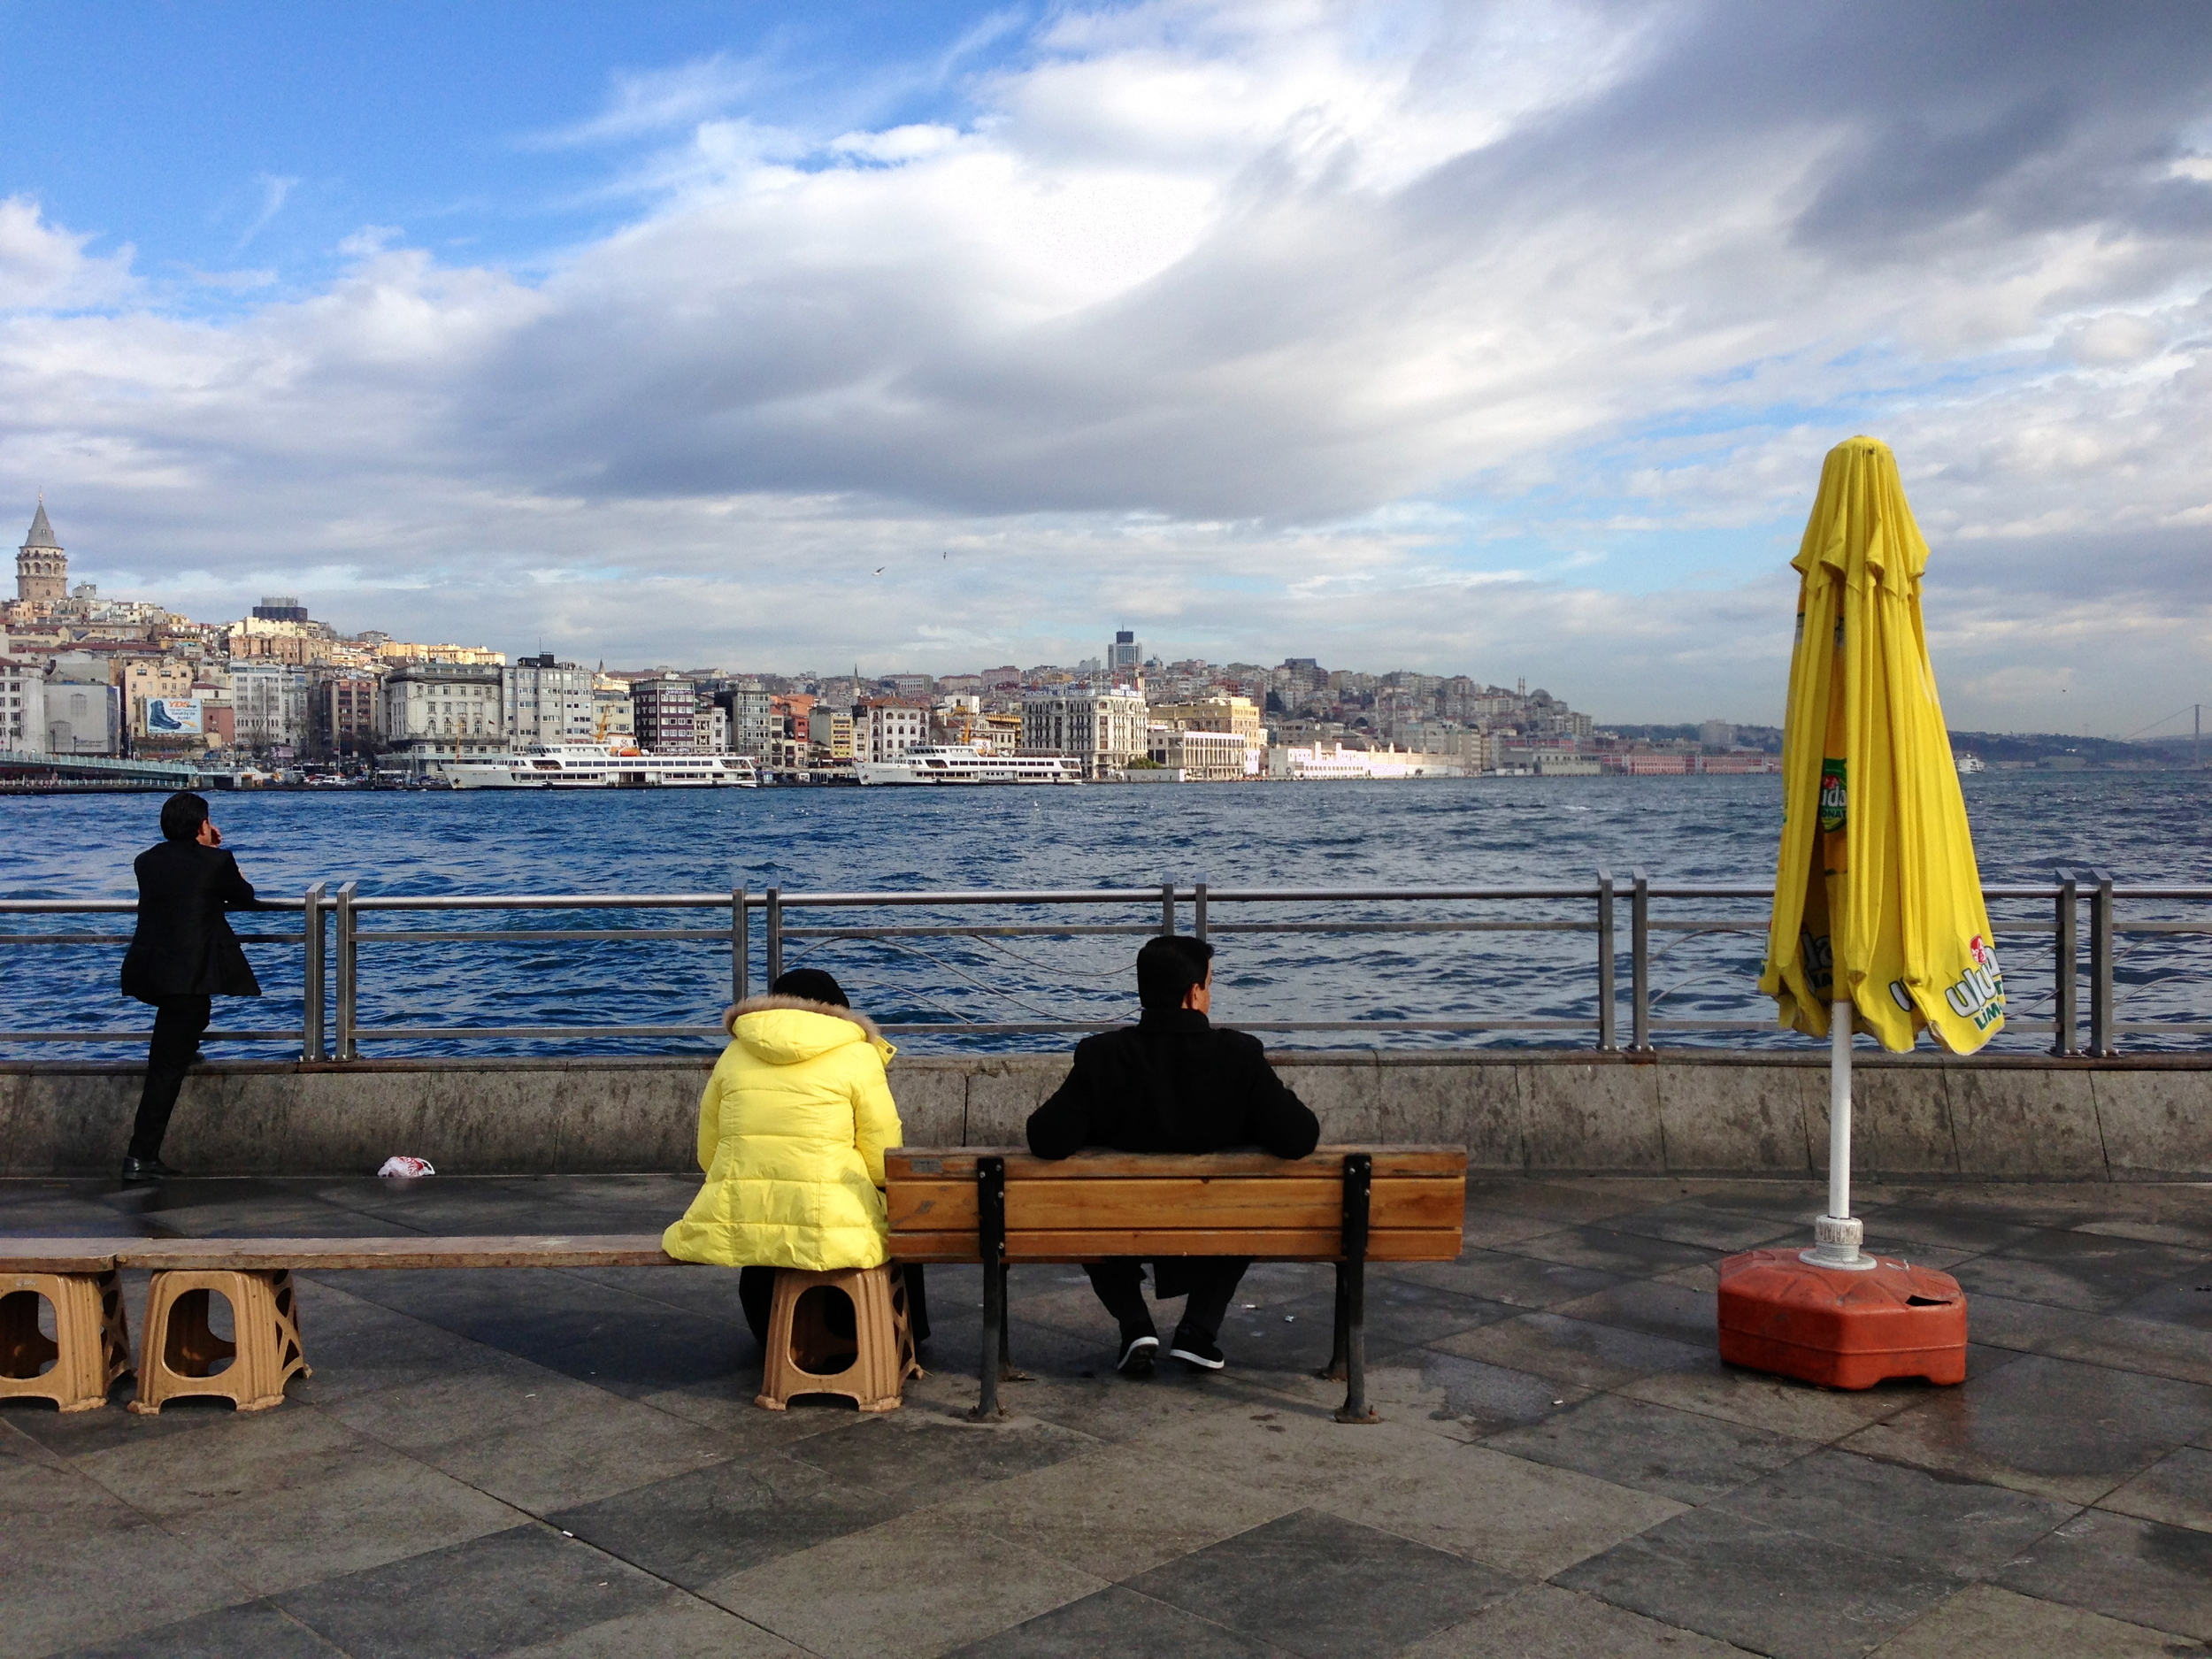 Eminönü, Février 2013 (photo : Canan Marasligil)